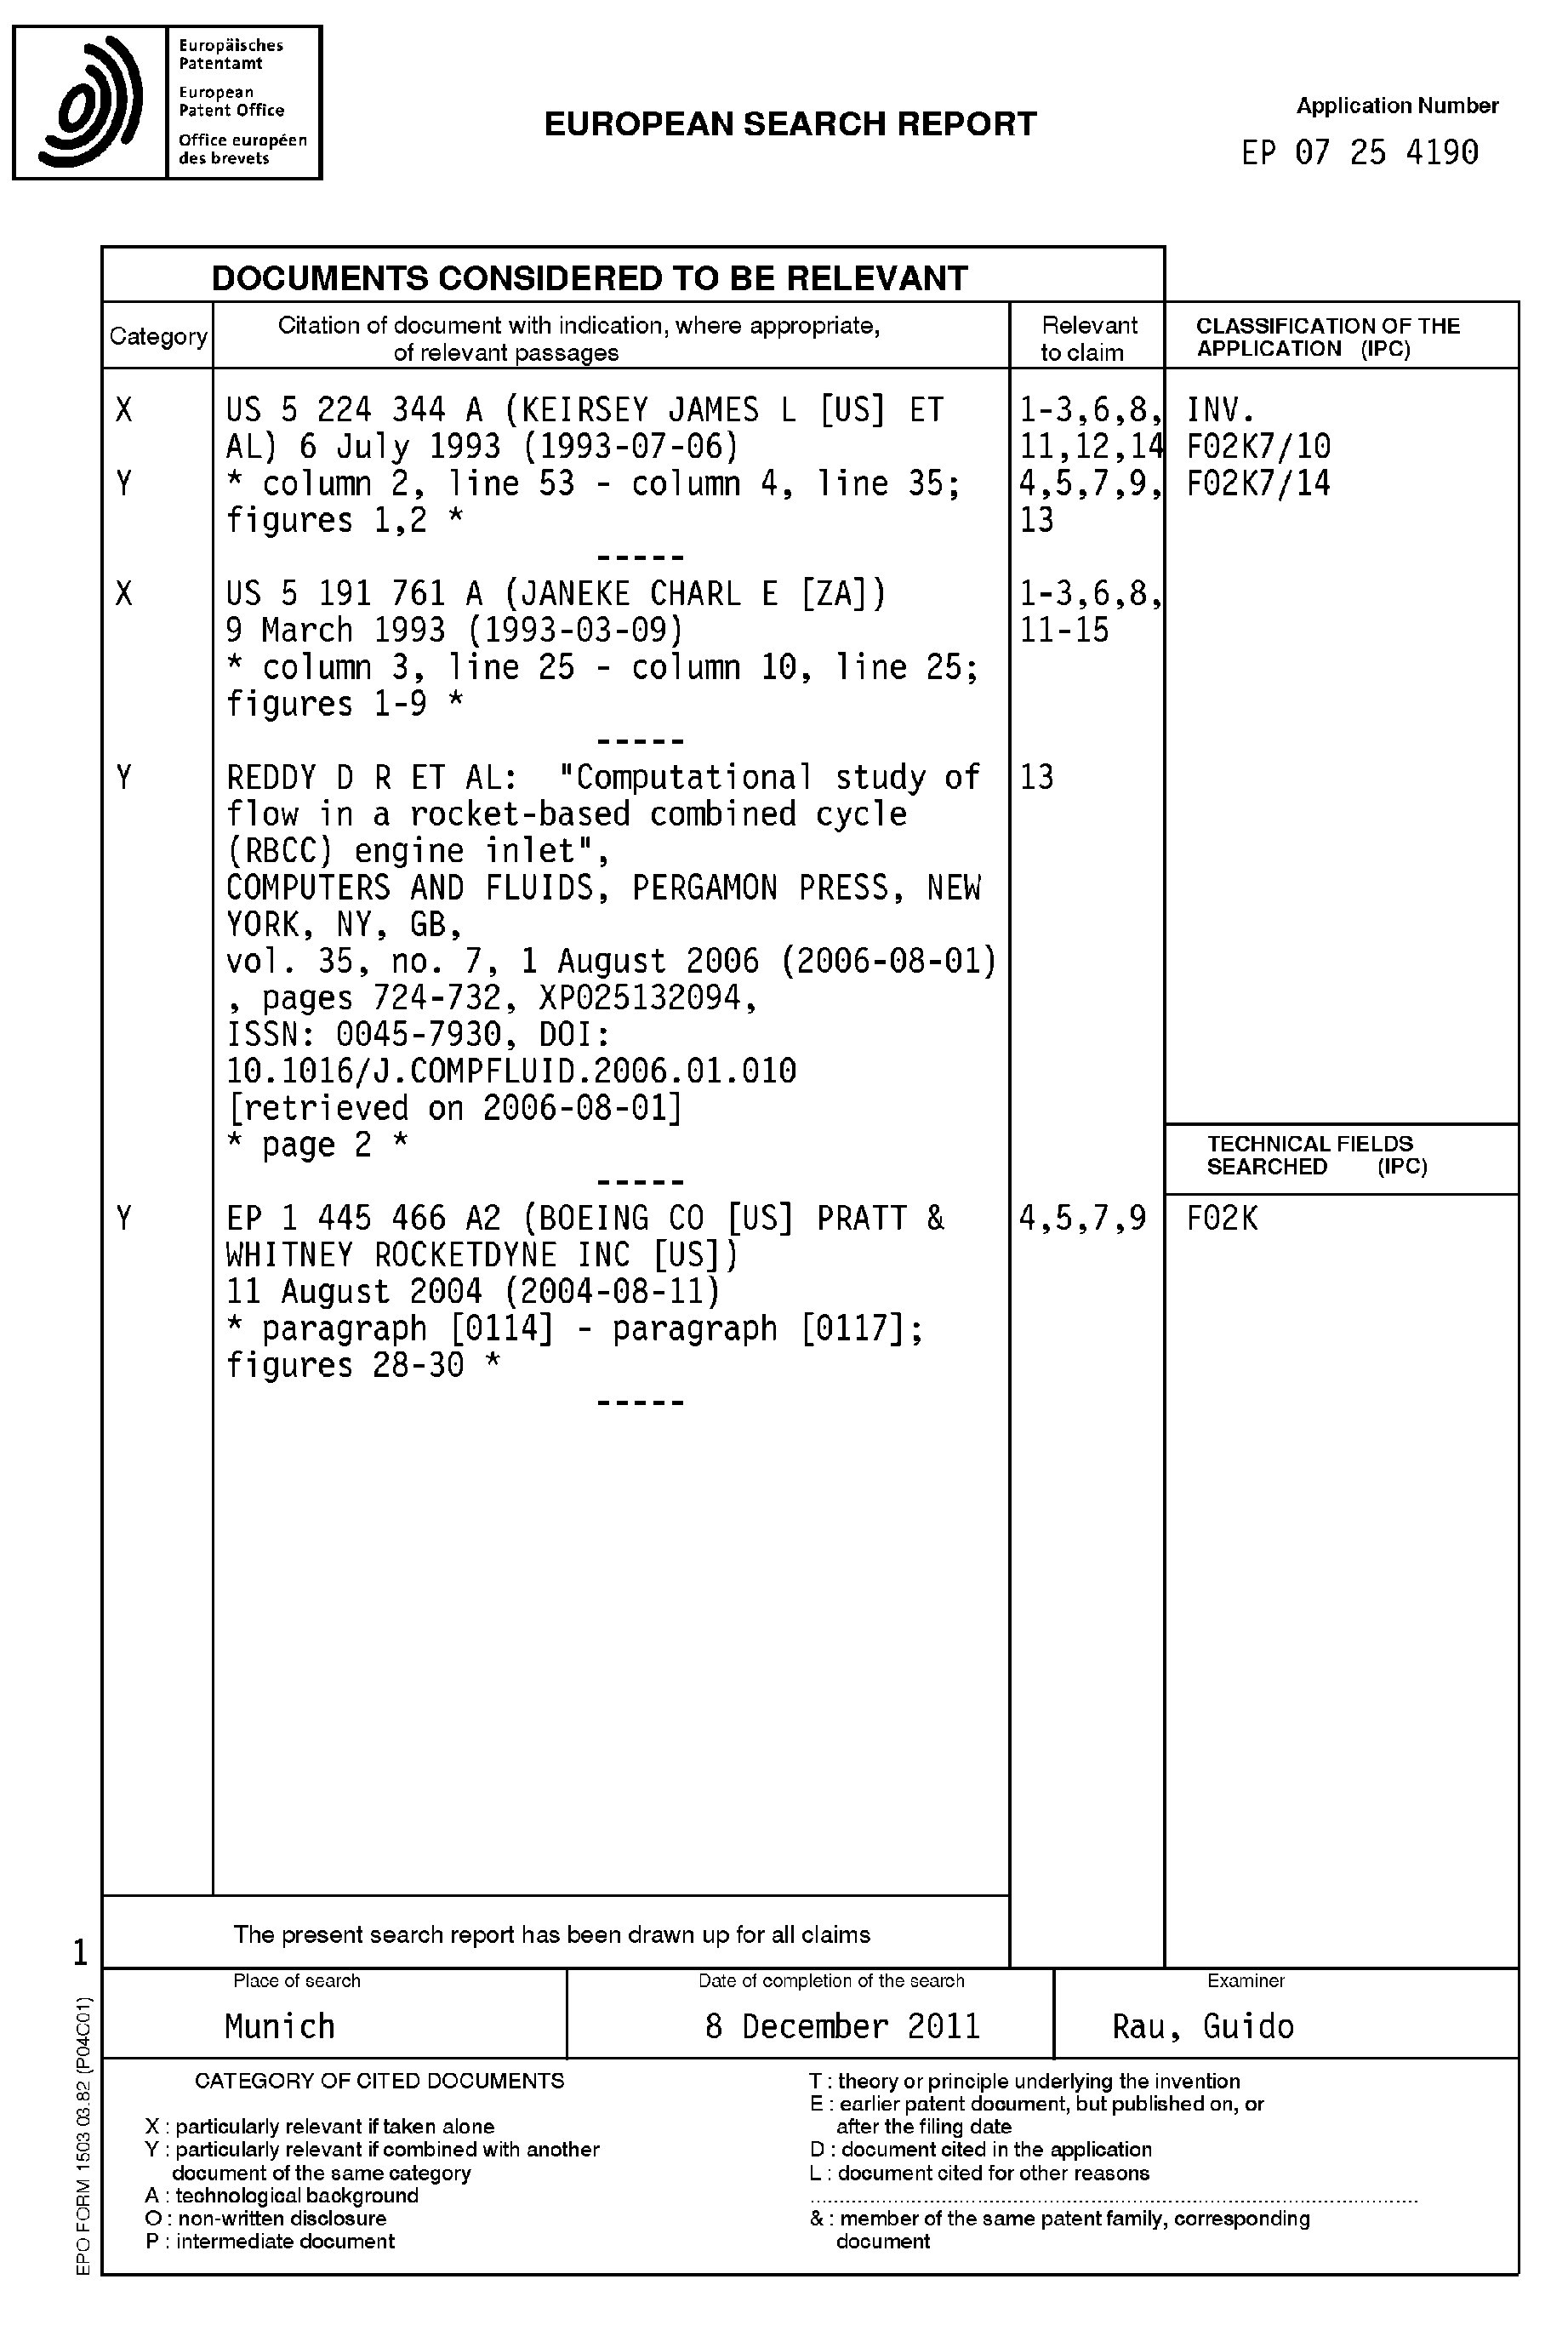 Scramjet/ramjet engine with annular isolator - Patent 1916407